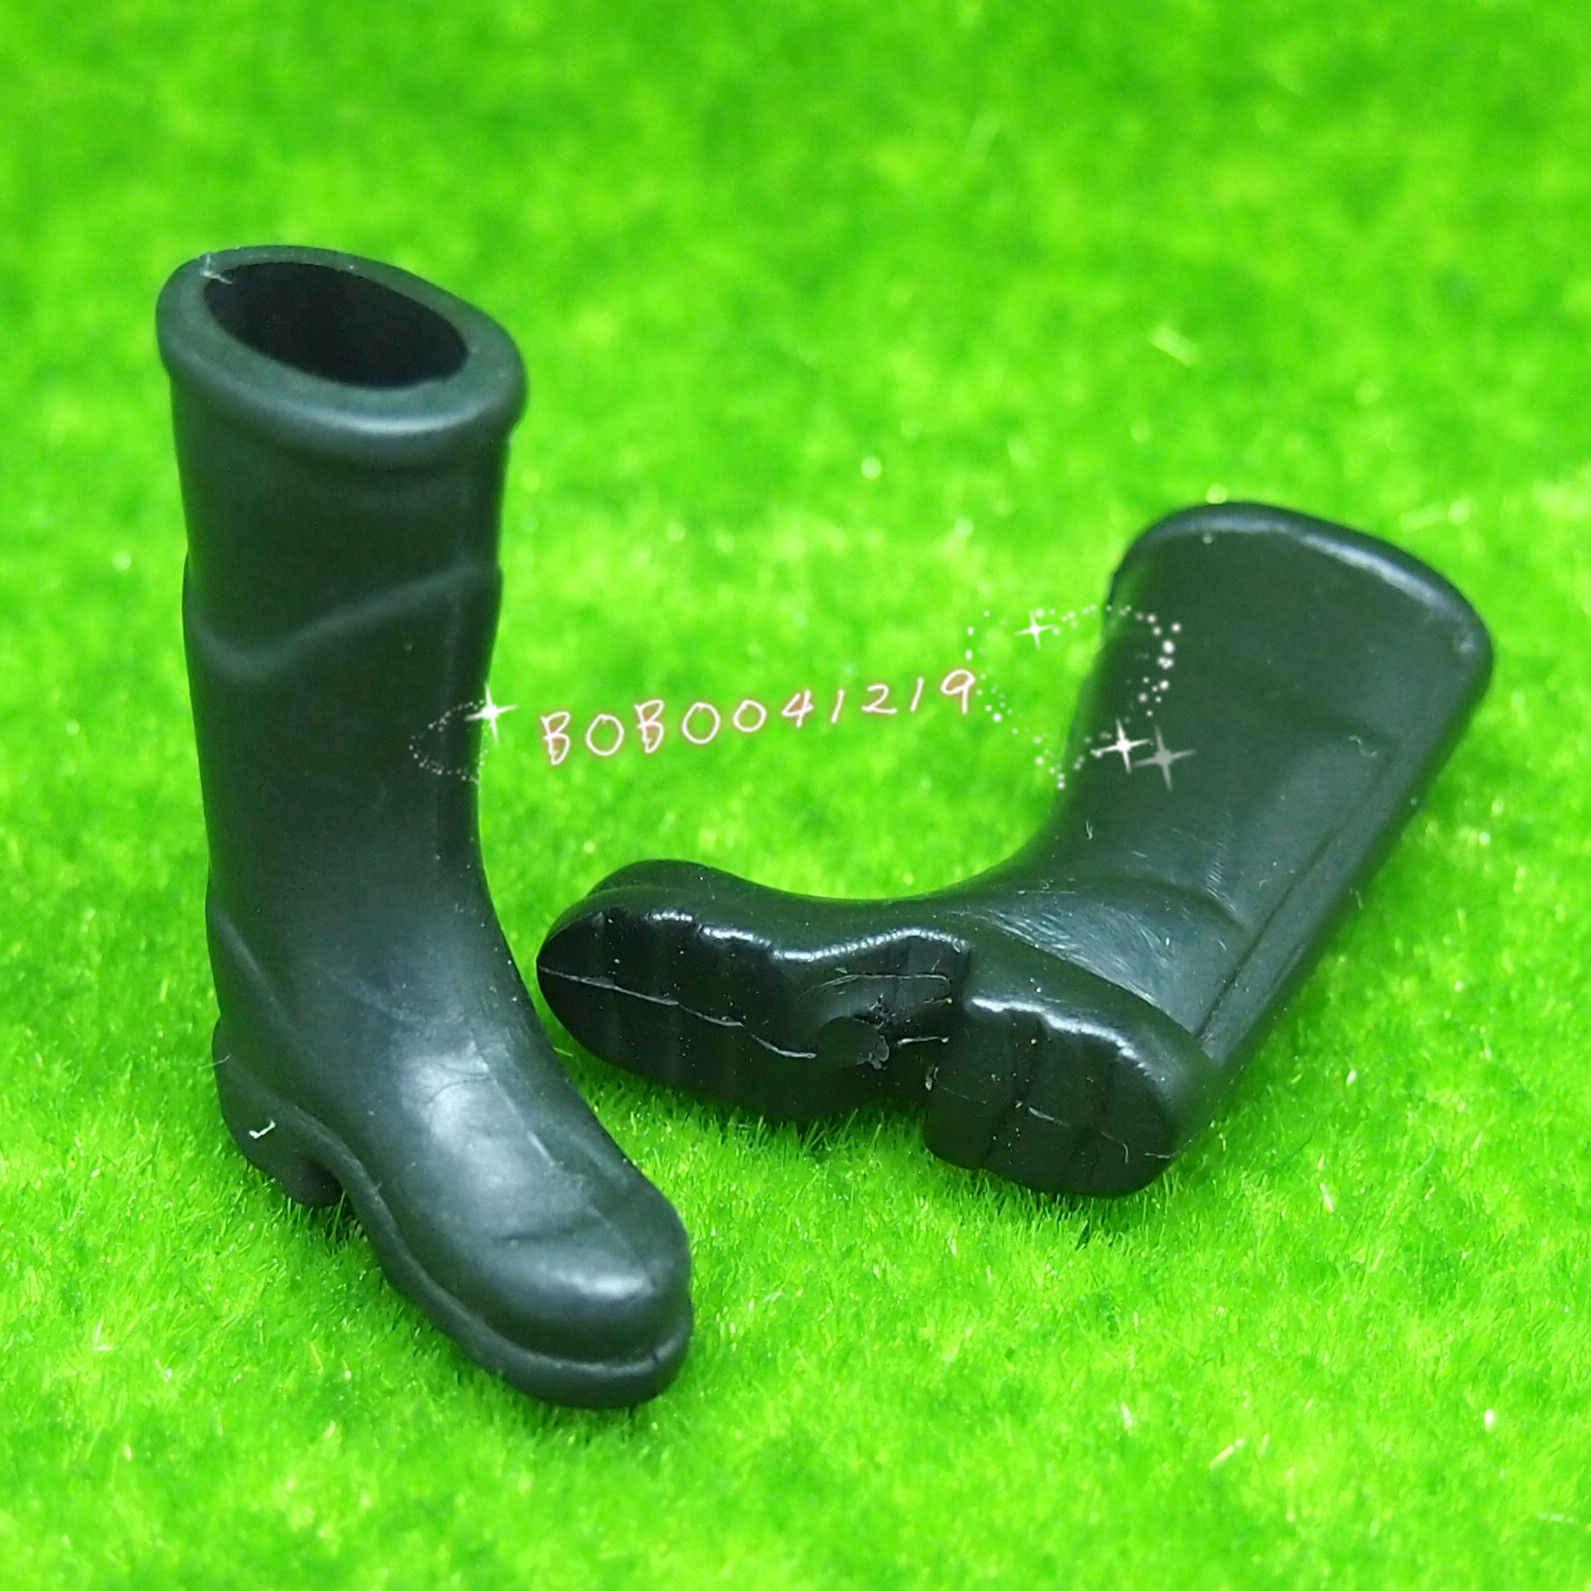 Casa de muñecas miniatura jardín un par de botas negras de goma altura 3,5 cm J17b